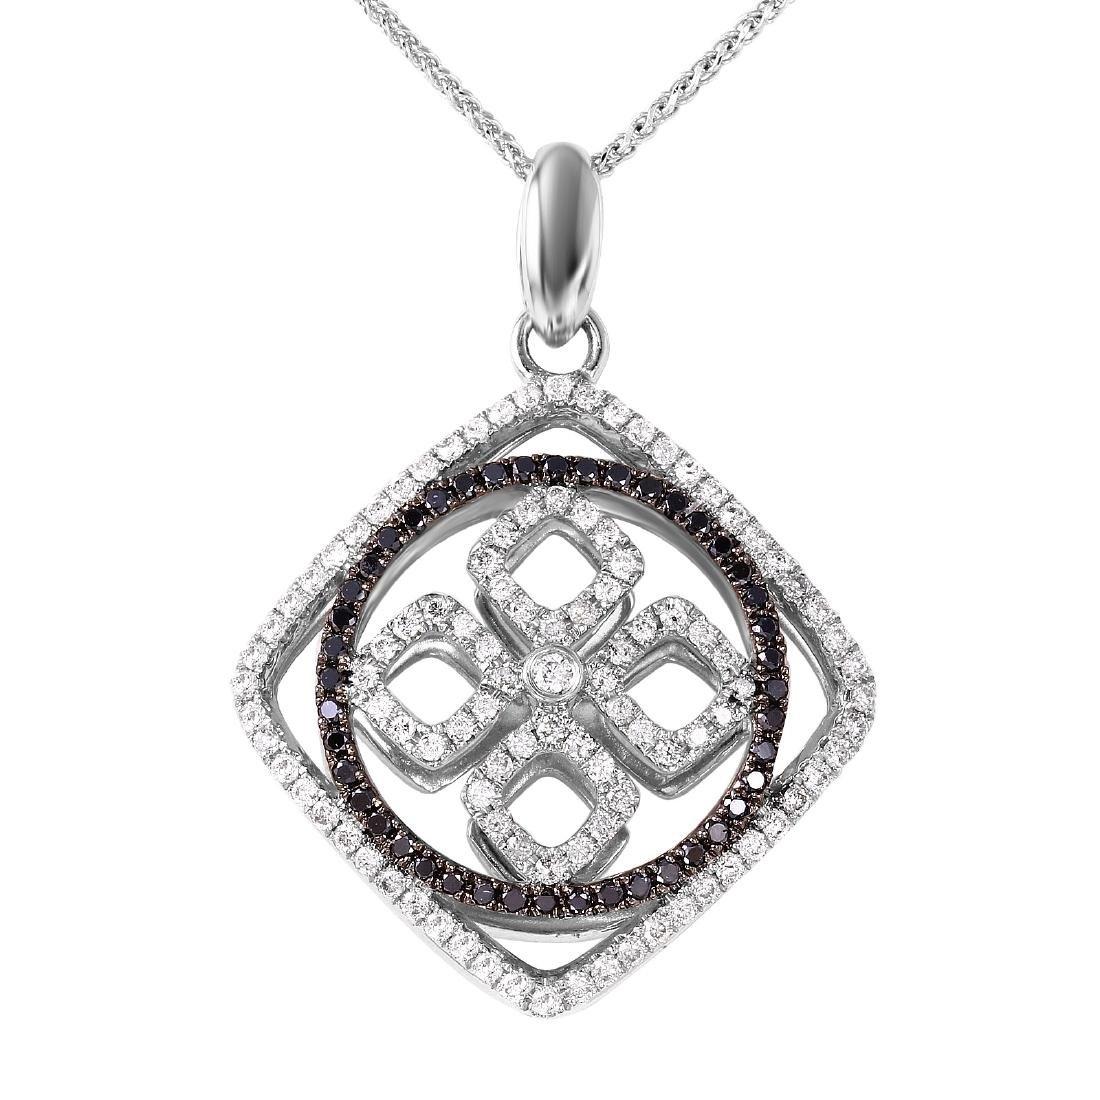 14KT White Gold 1.01ctw Diamond Pendant Chain Length